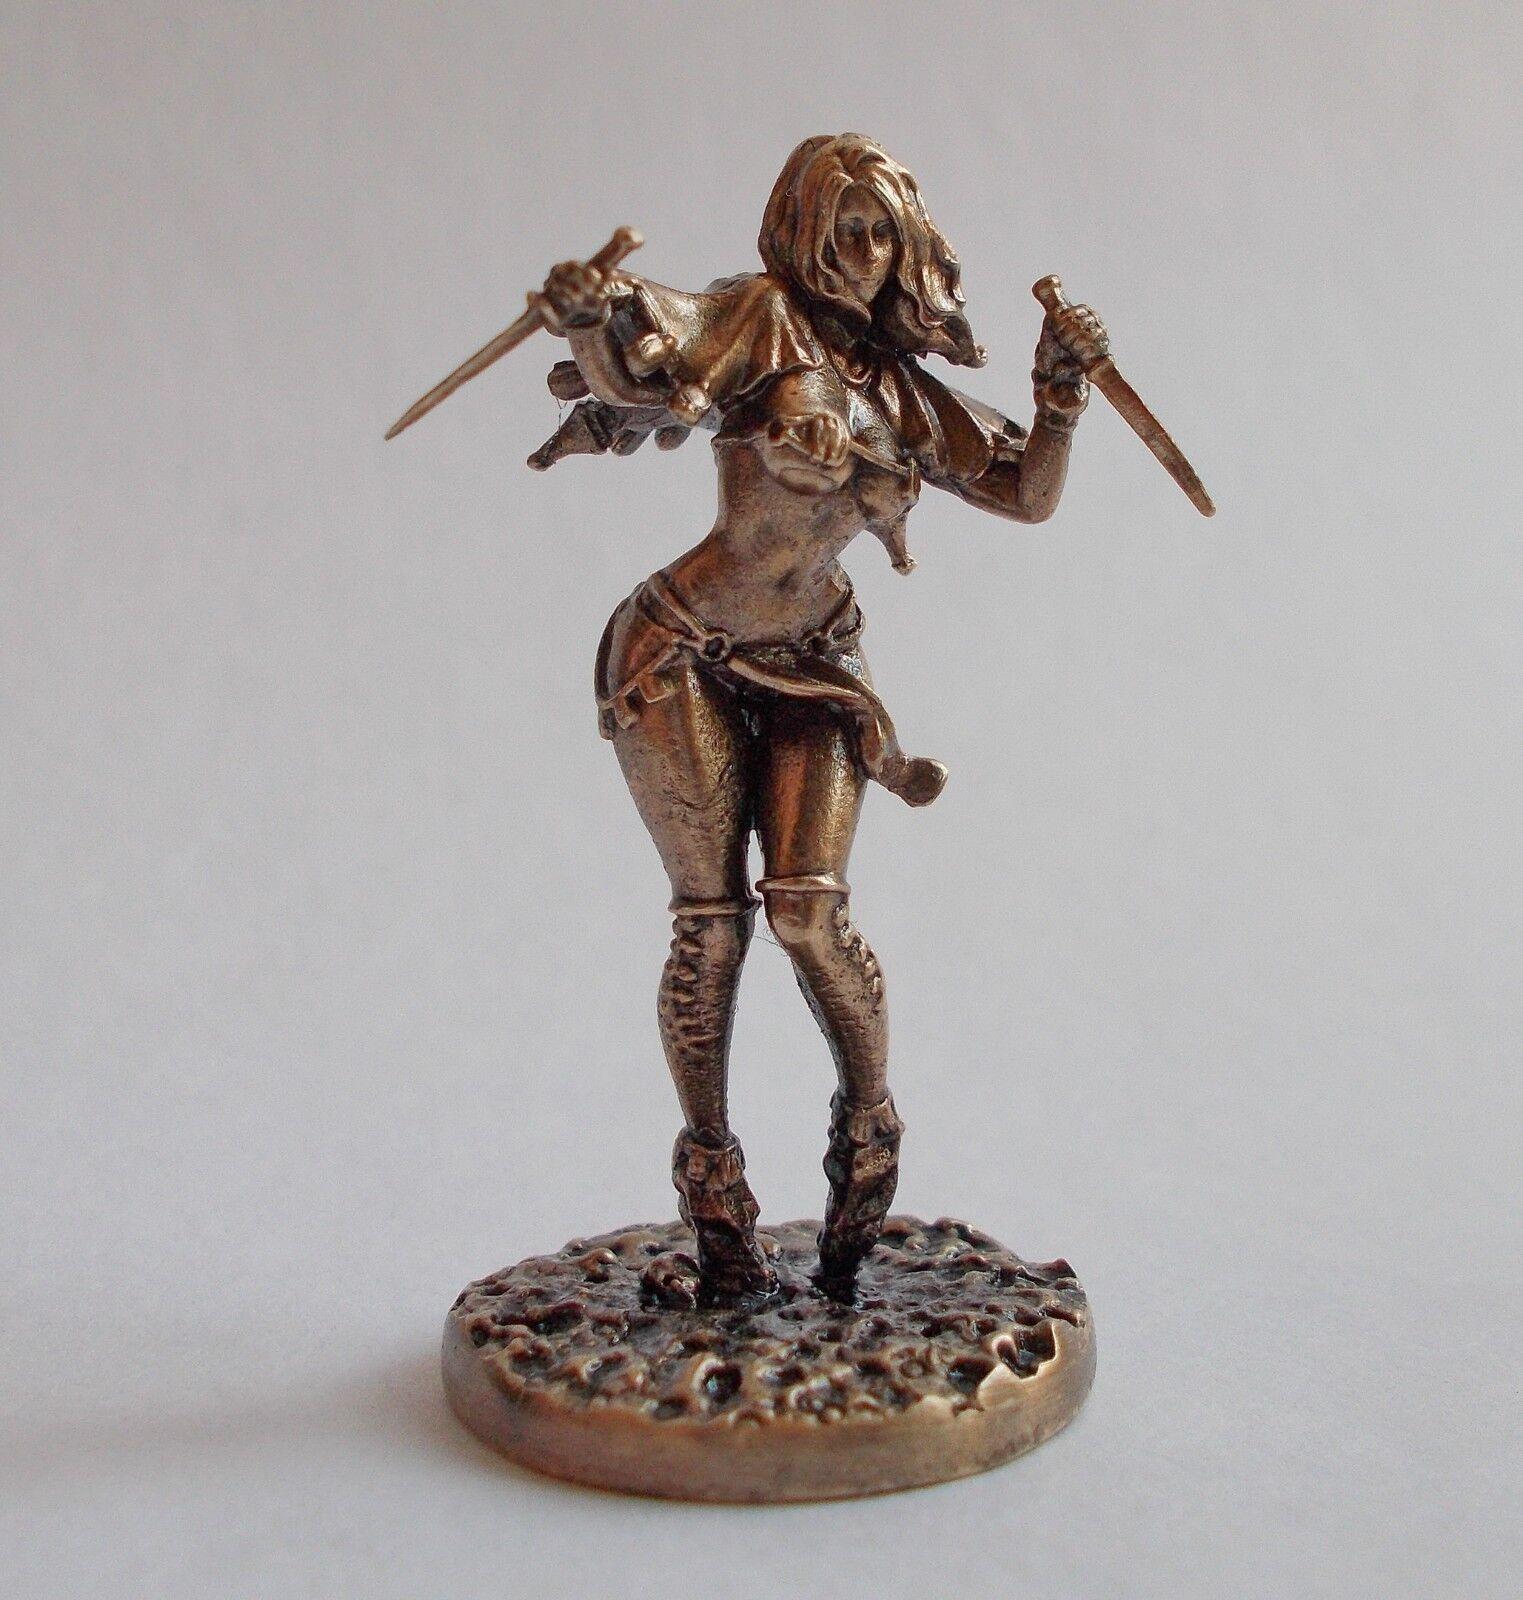 Reino de la muerte Pinup sunstalker Bailarina Bronce  DK20 de conversión (Metal)